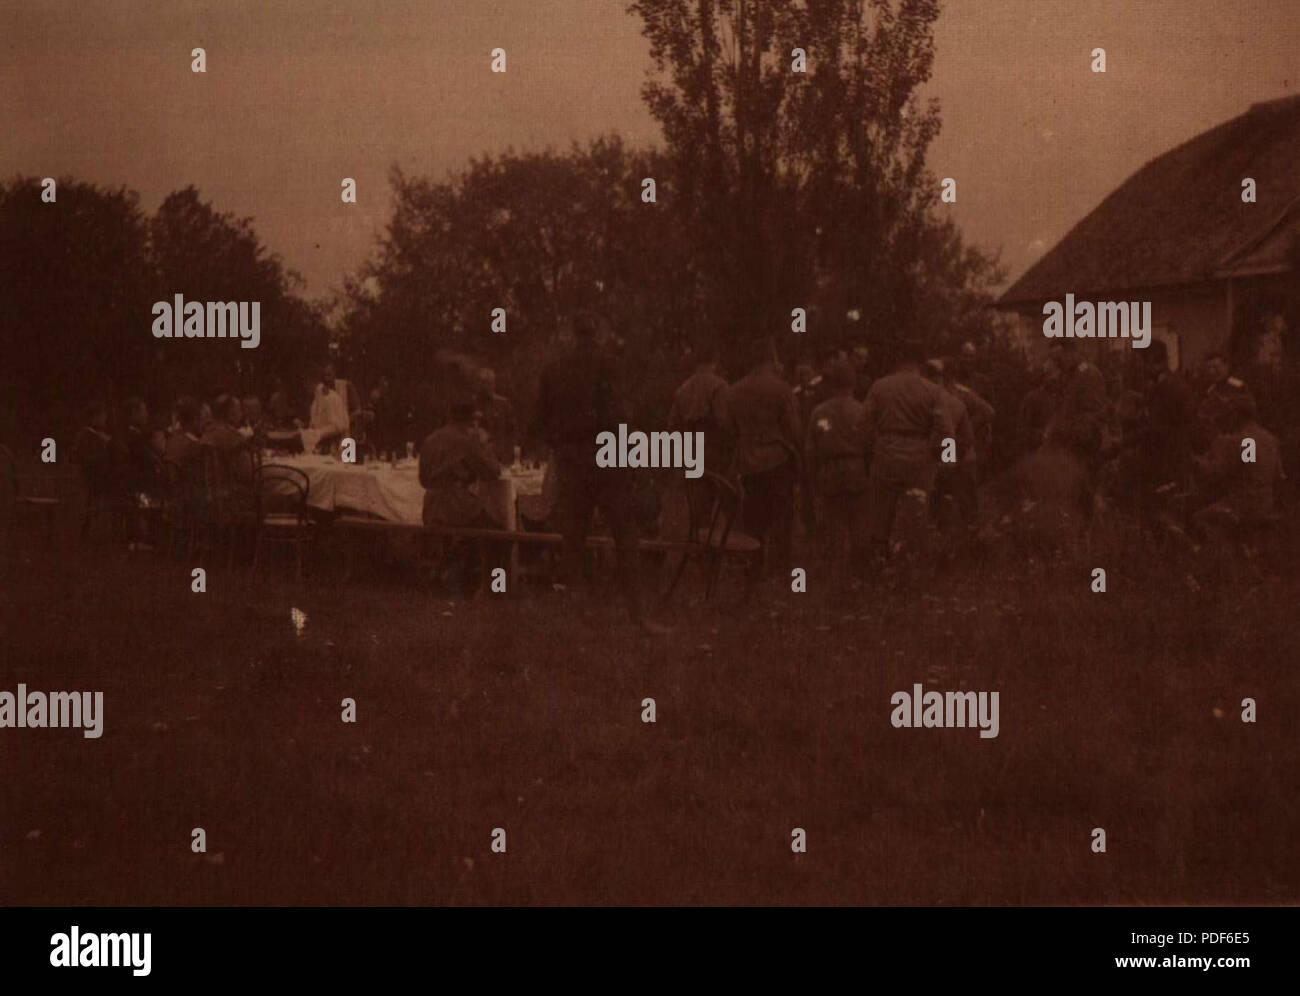 8a 1 Stock Photos & 8a 1 Stock Images - Alamy